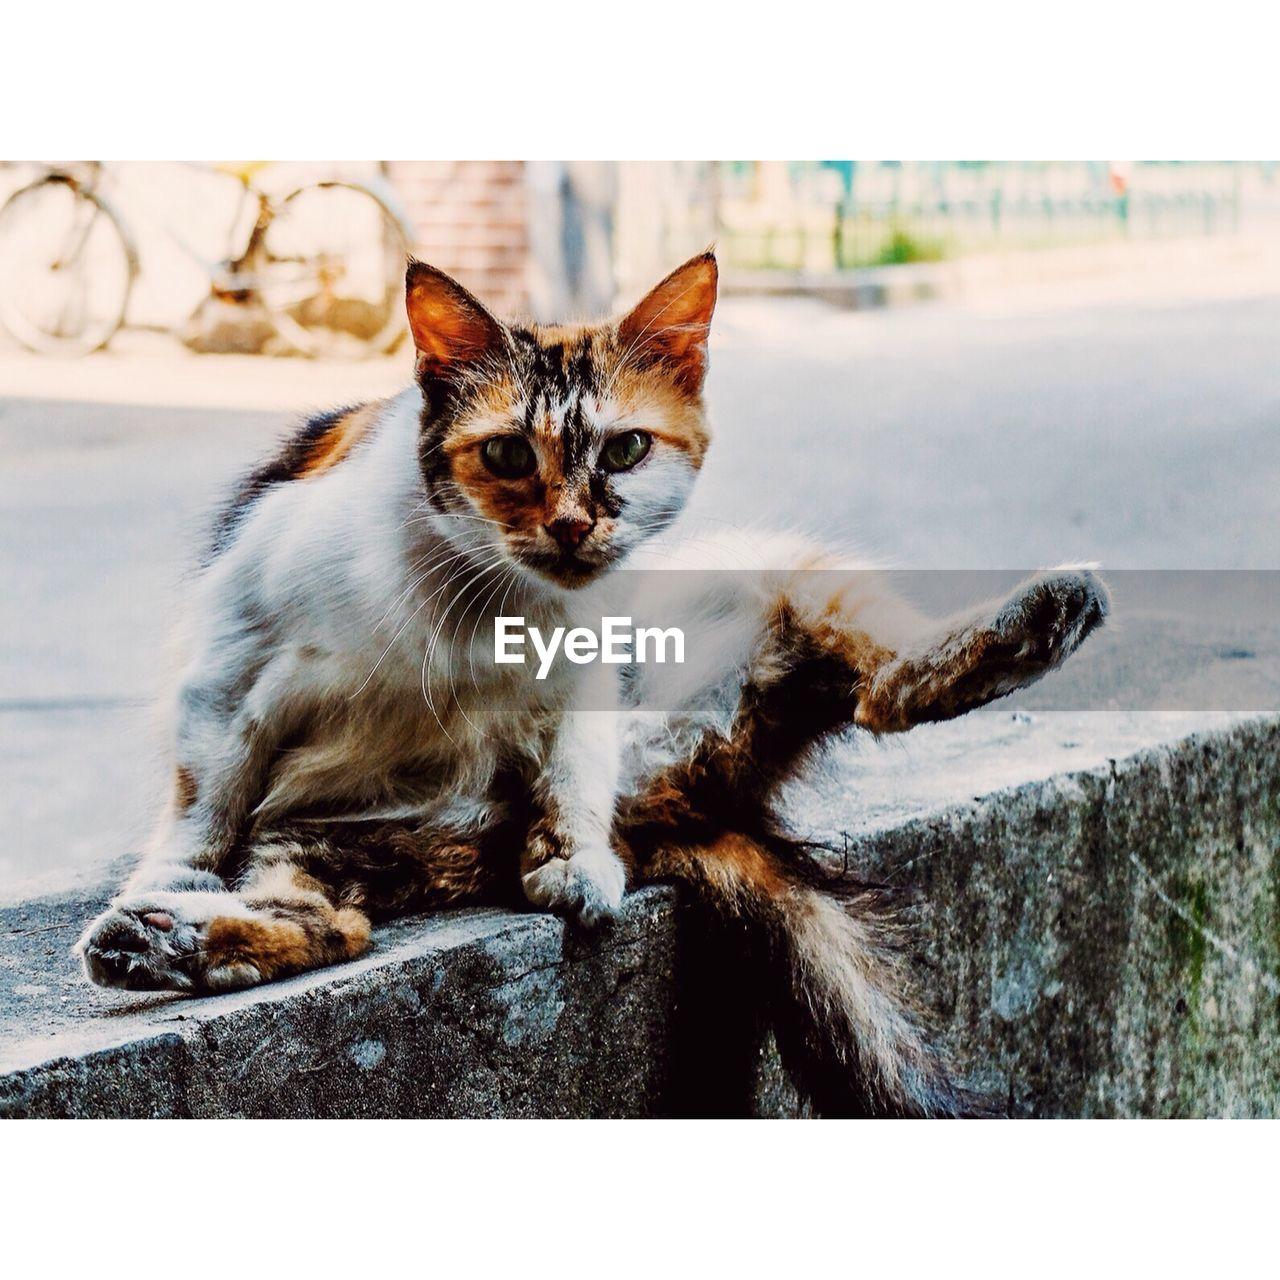 Portrait Of Cat Relaxing On Street